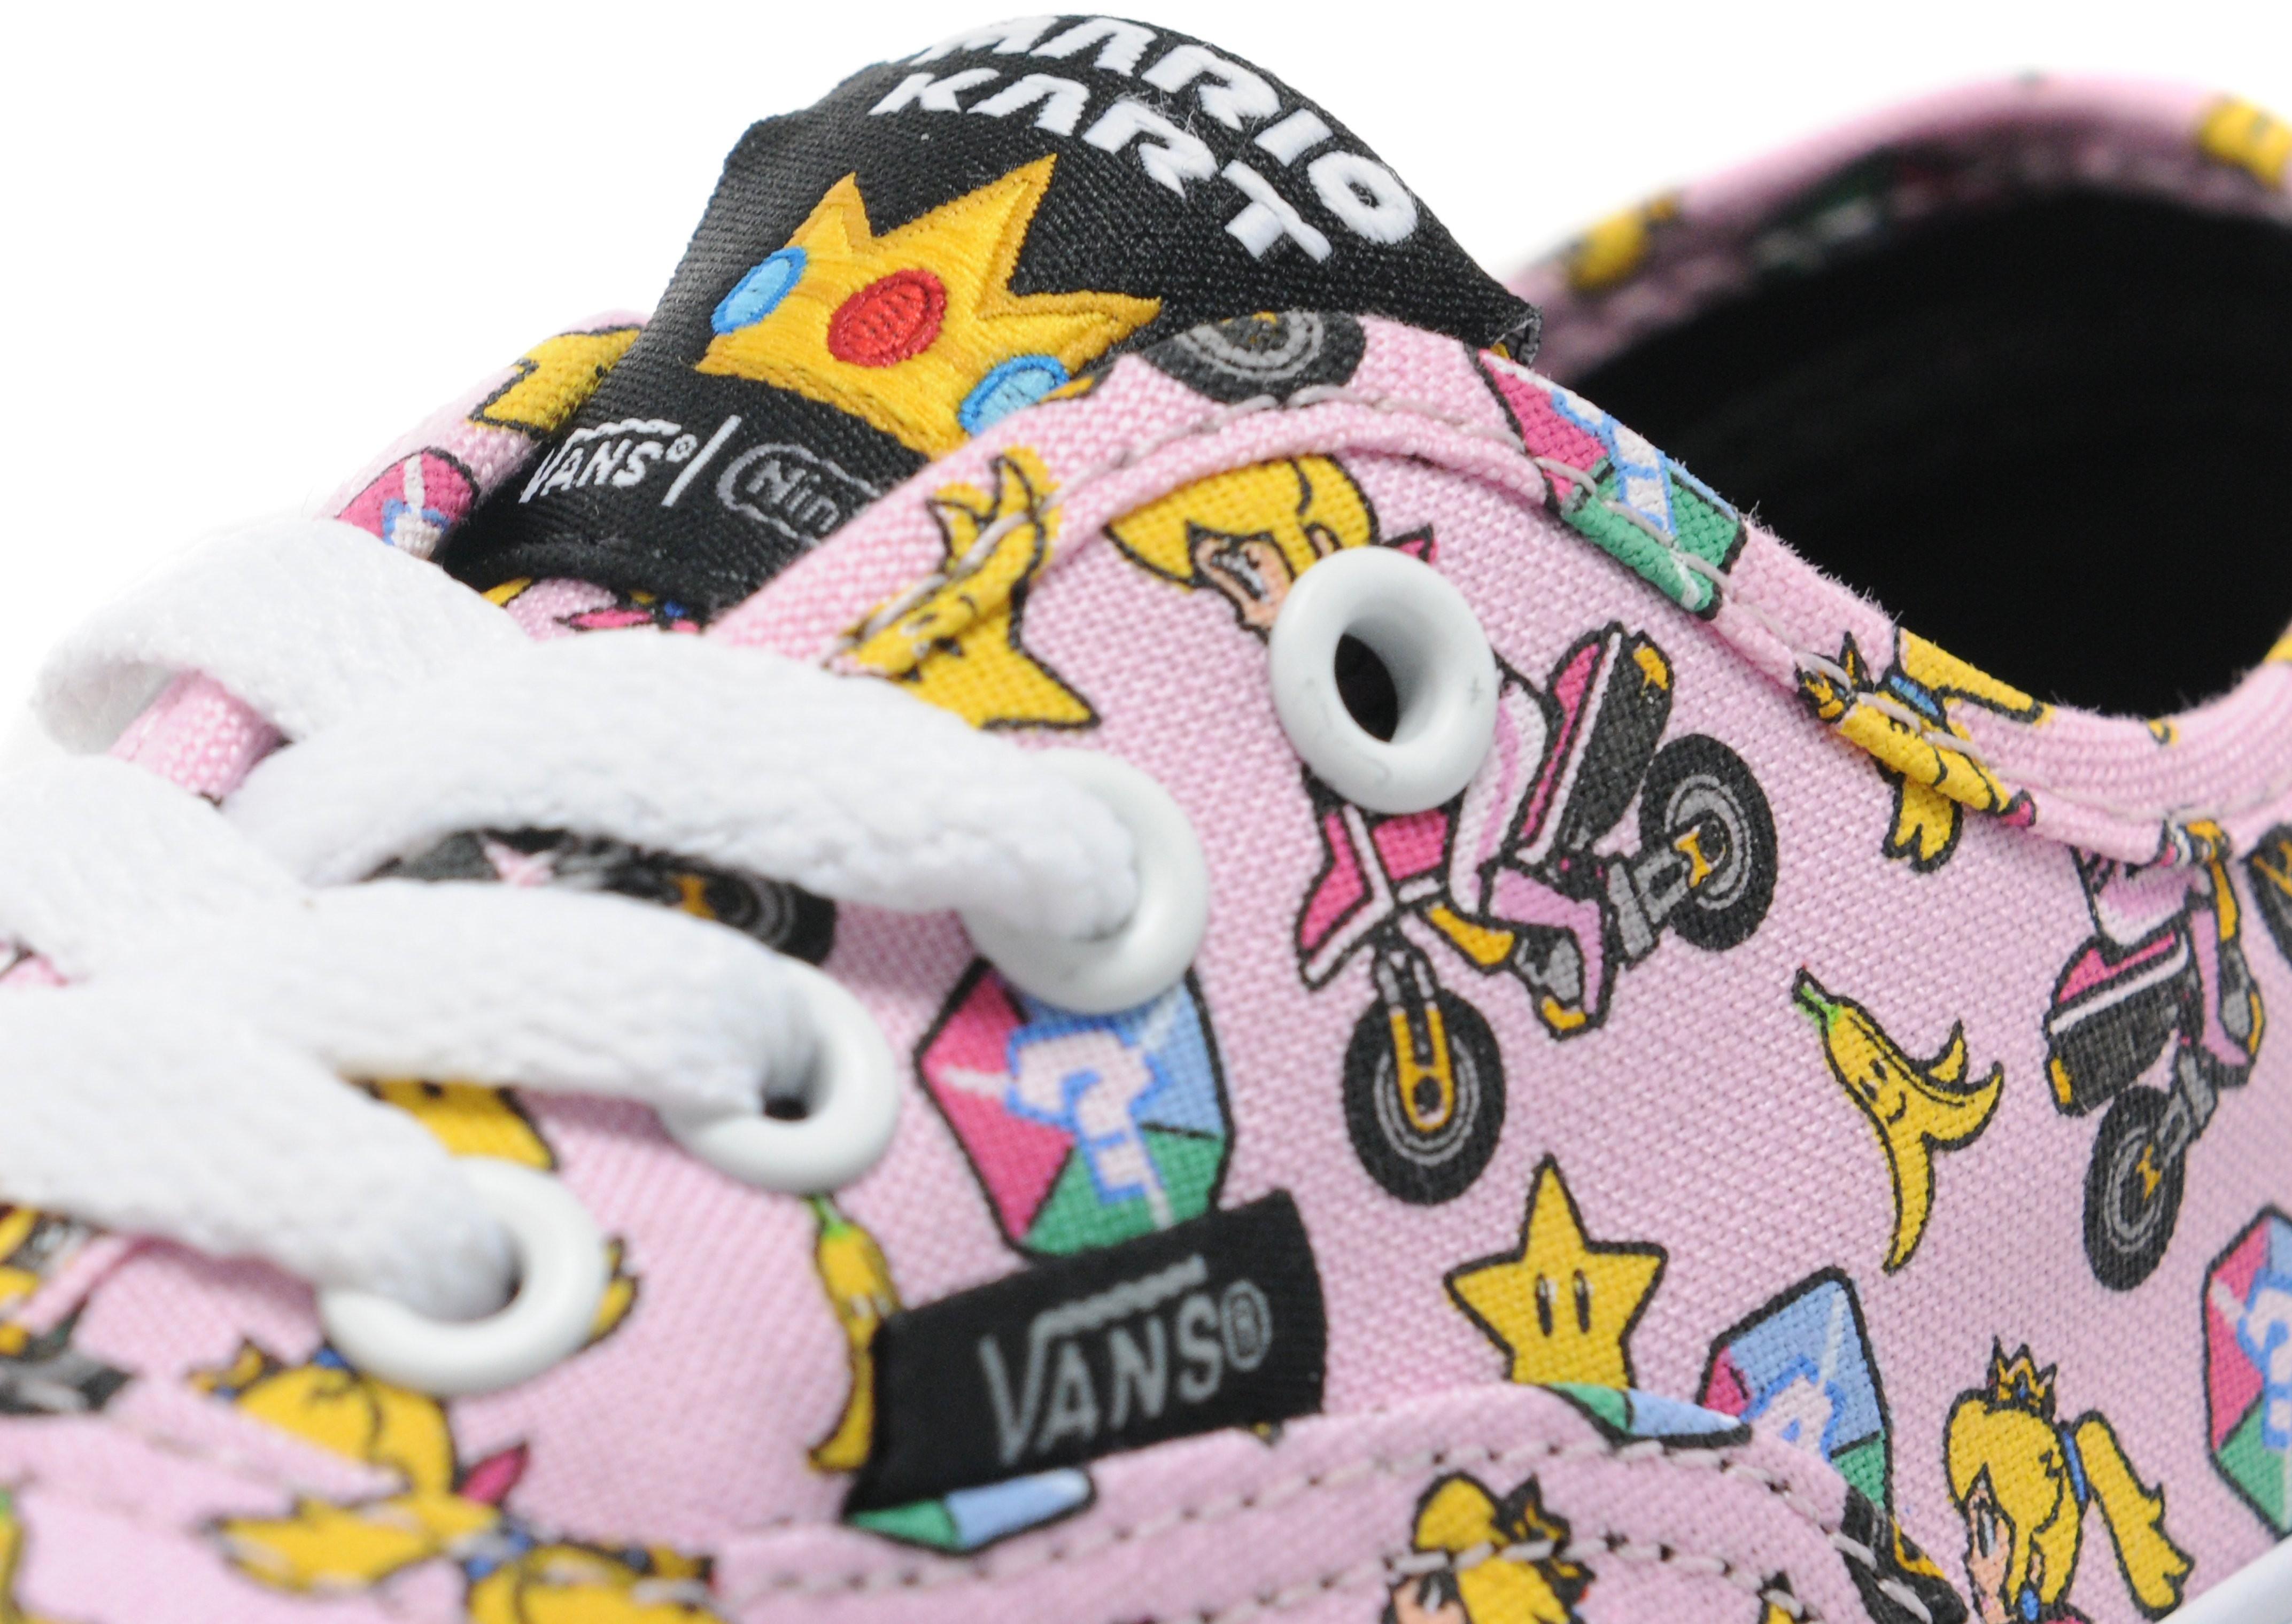 Vans x Nintendo Princess Peach Authentic Children